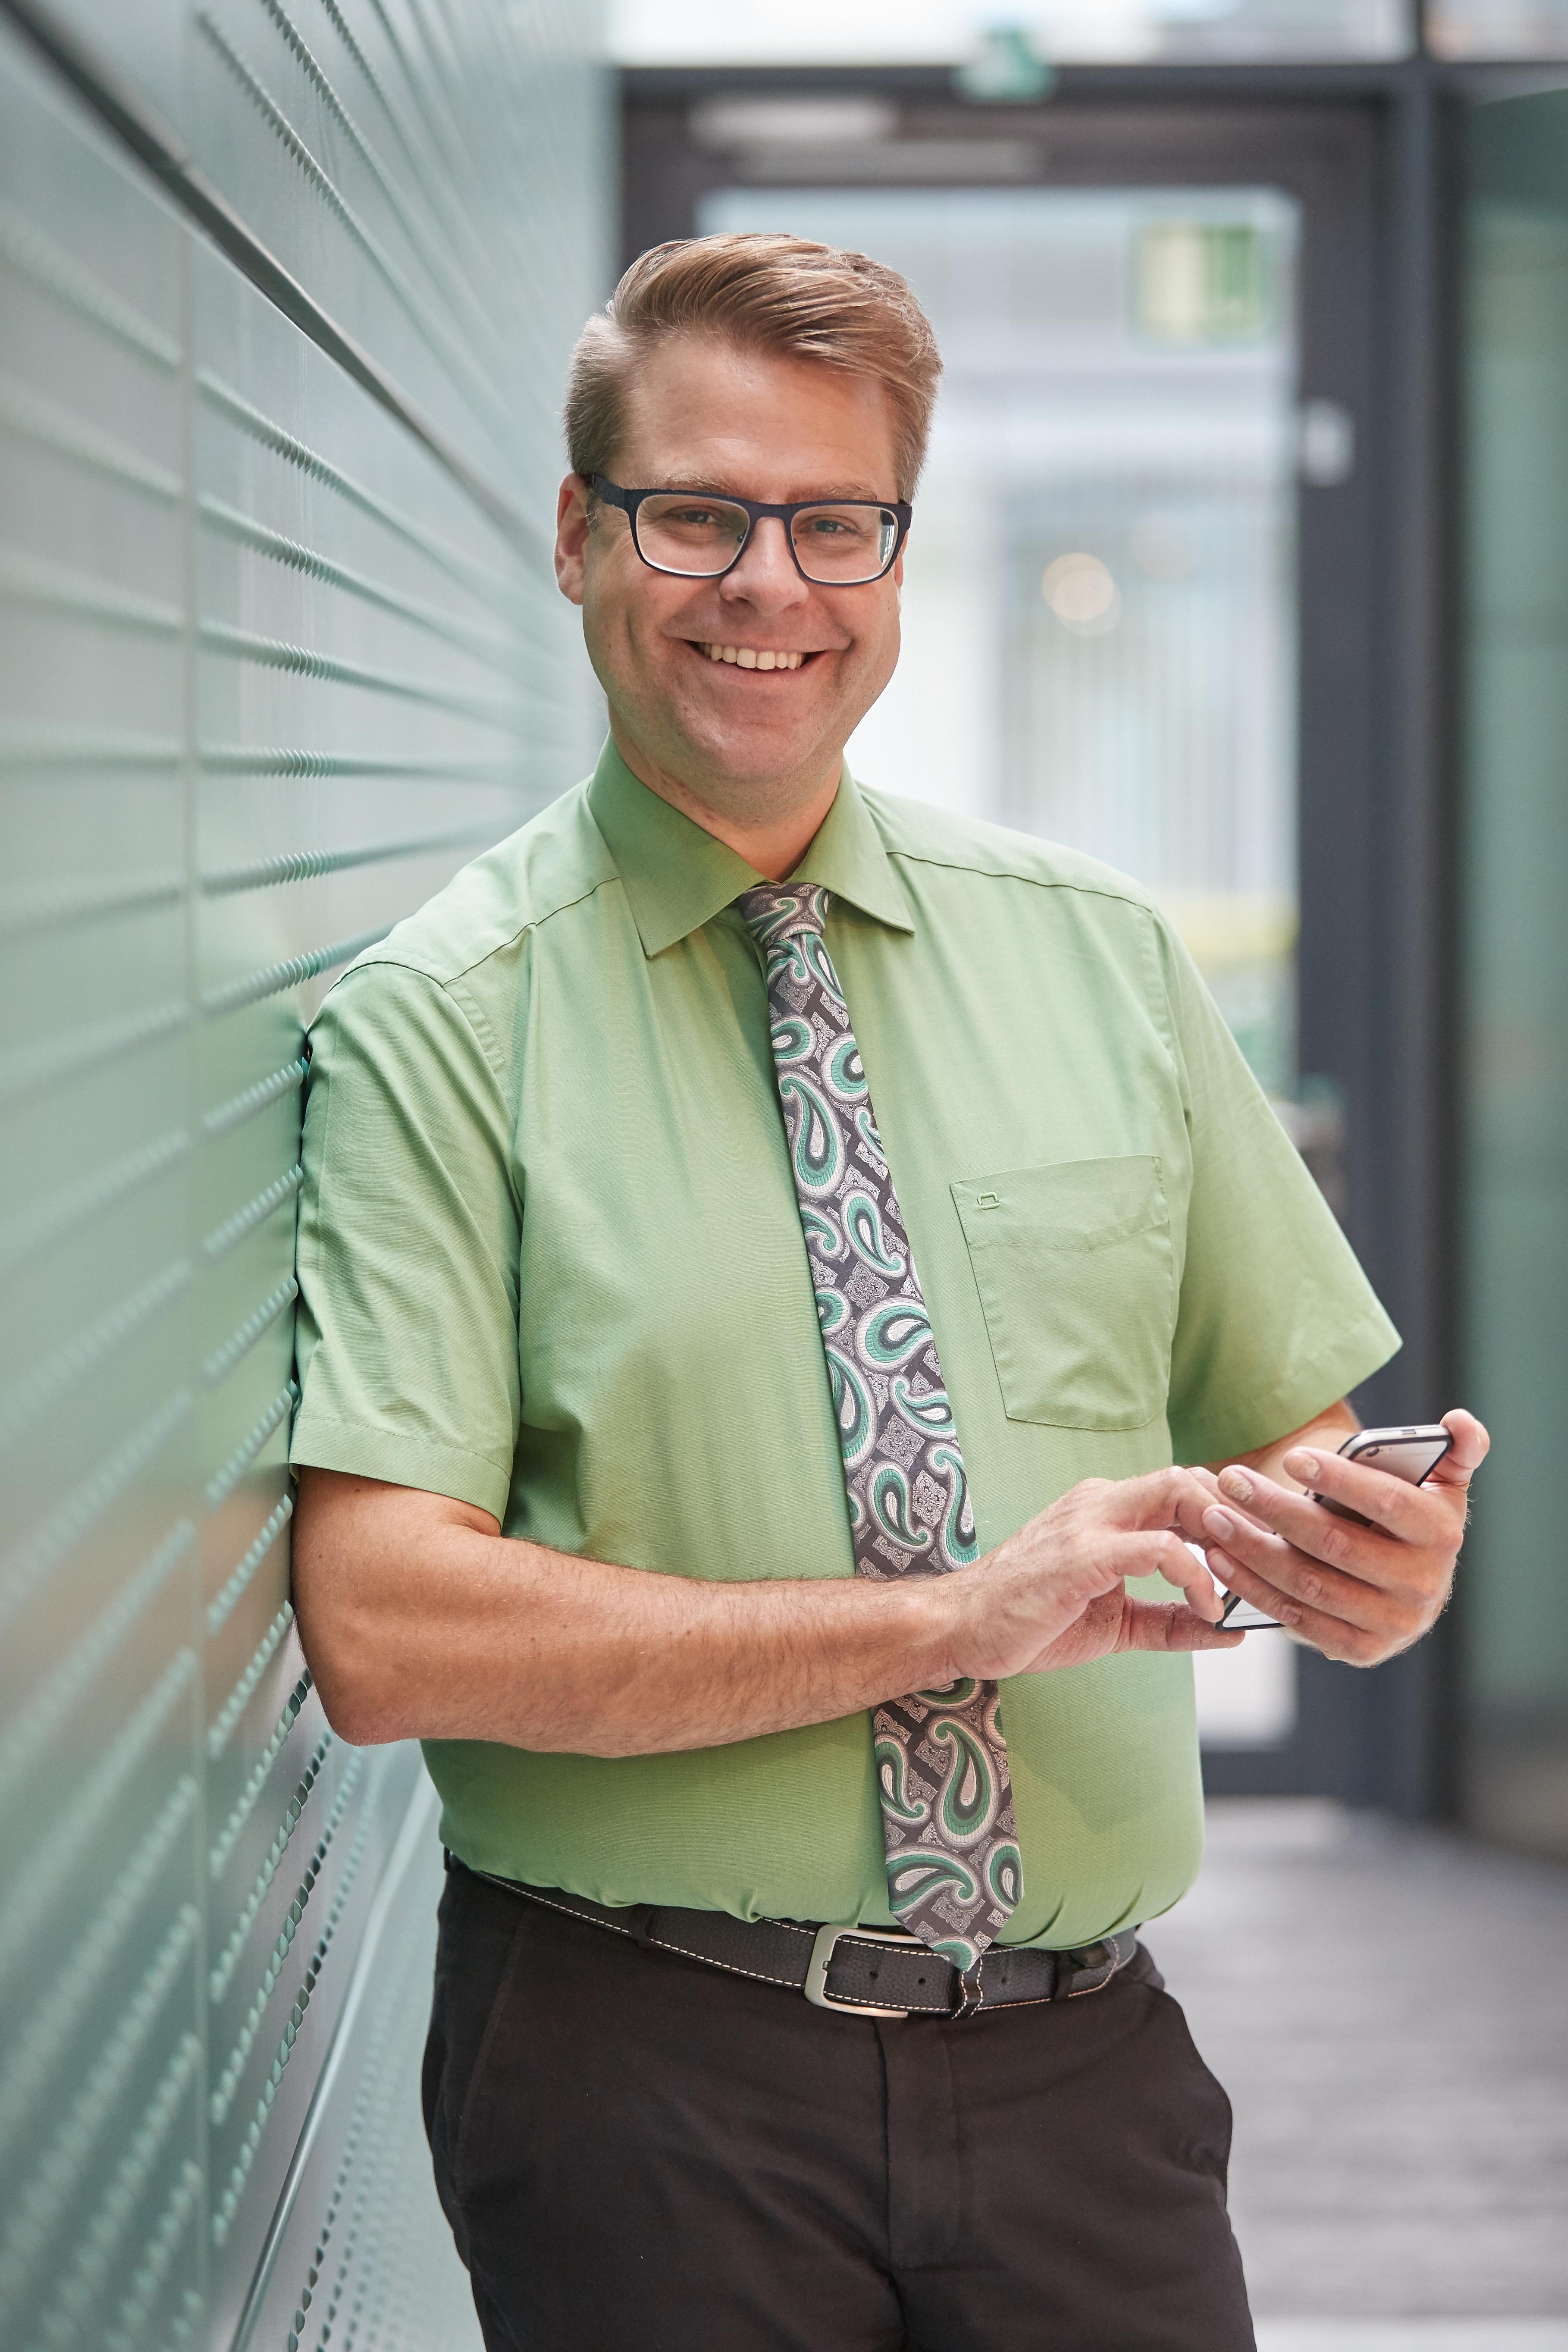 Mathias Reimann - spokesperson for the LGBTI network